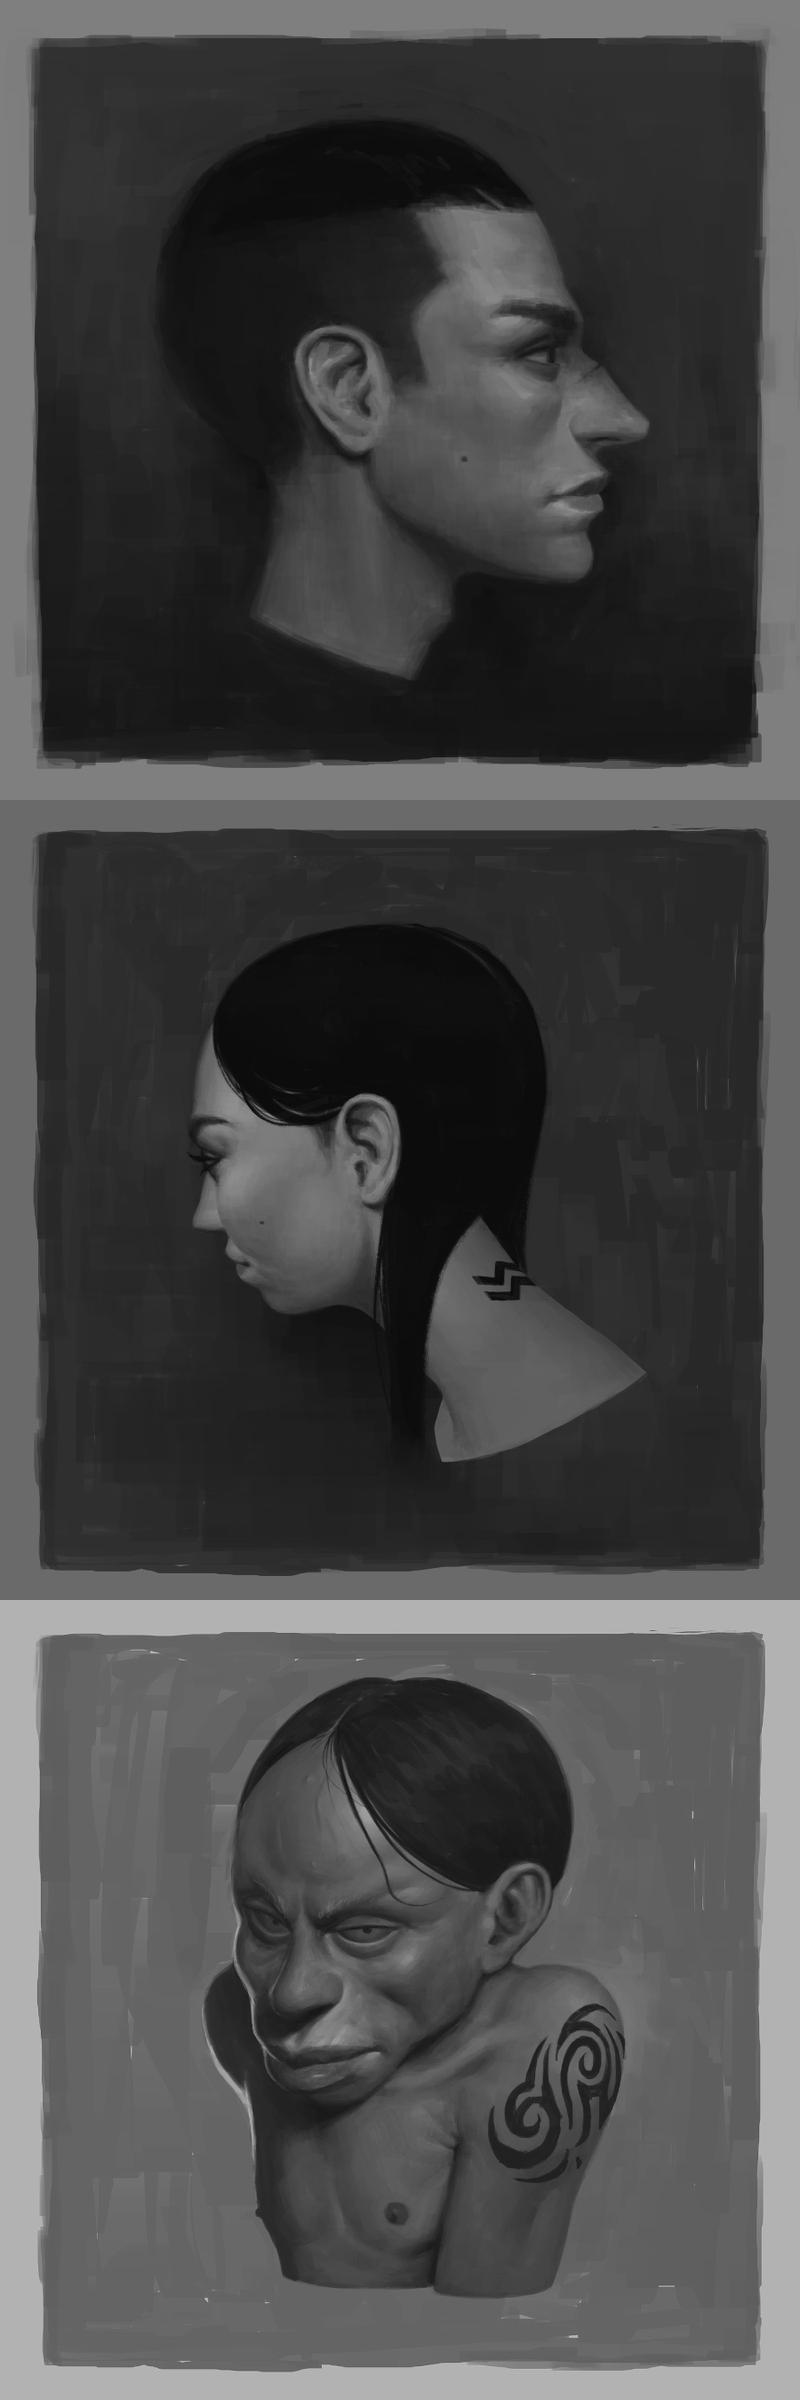 3 Faces by henrikutvonen